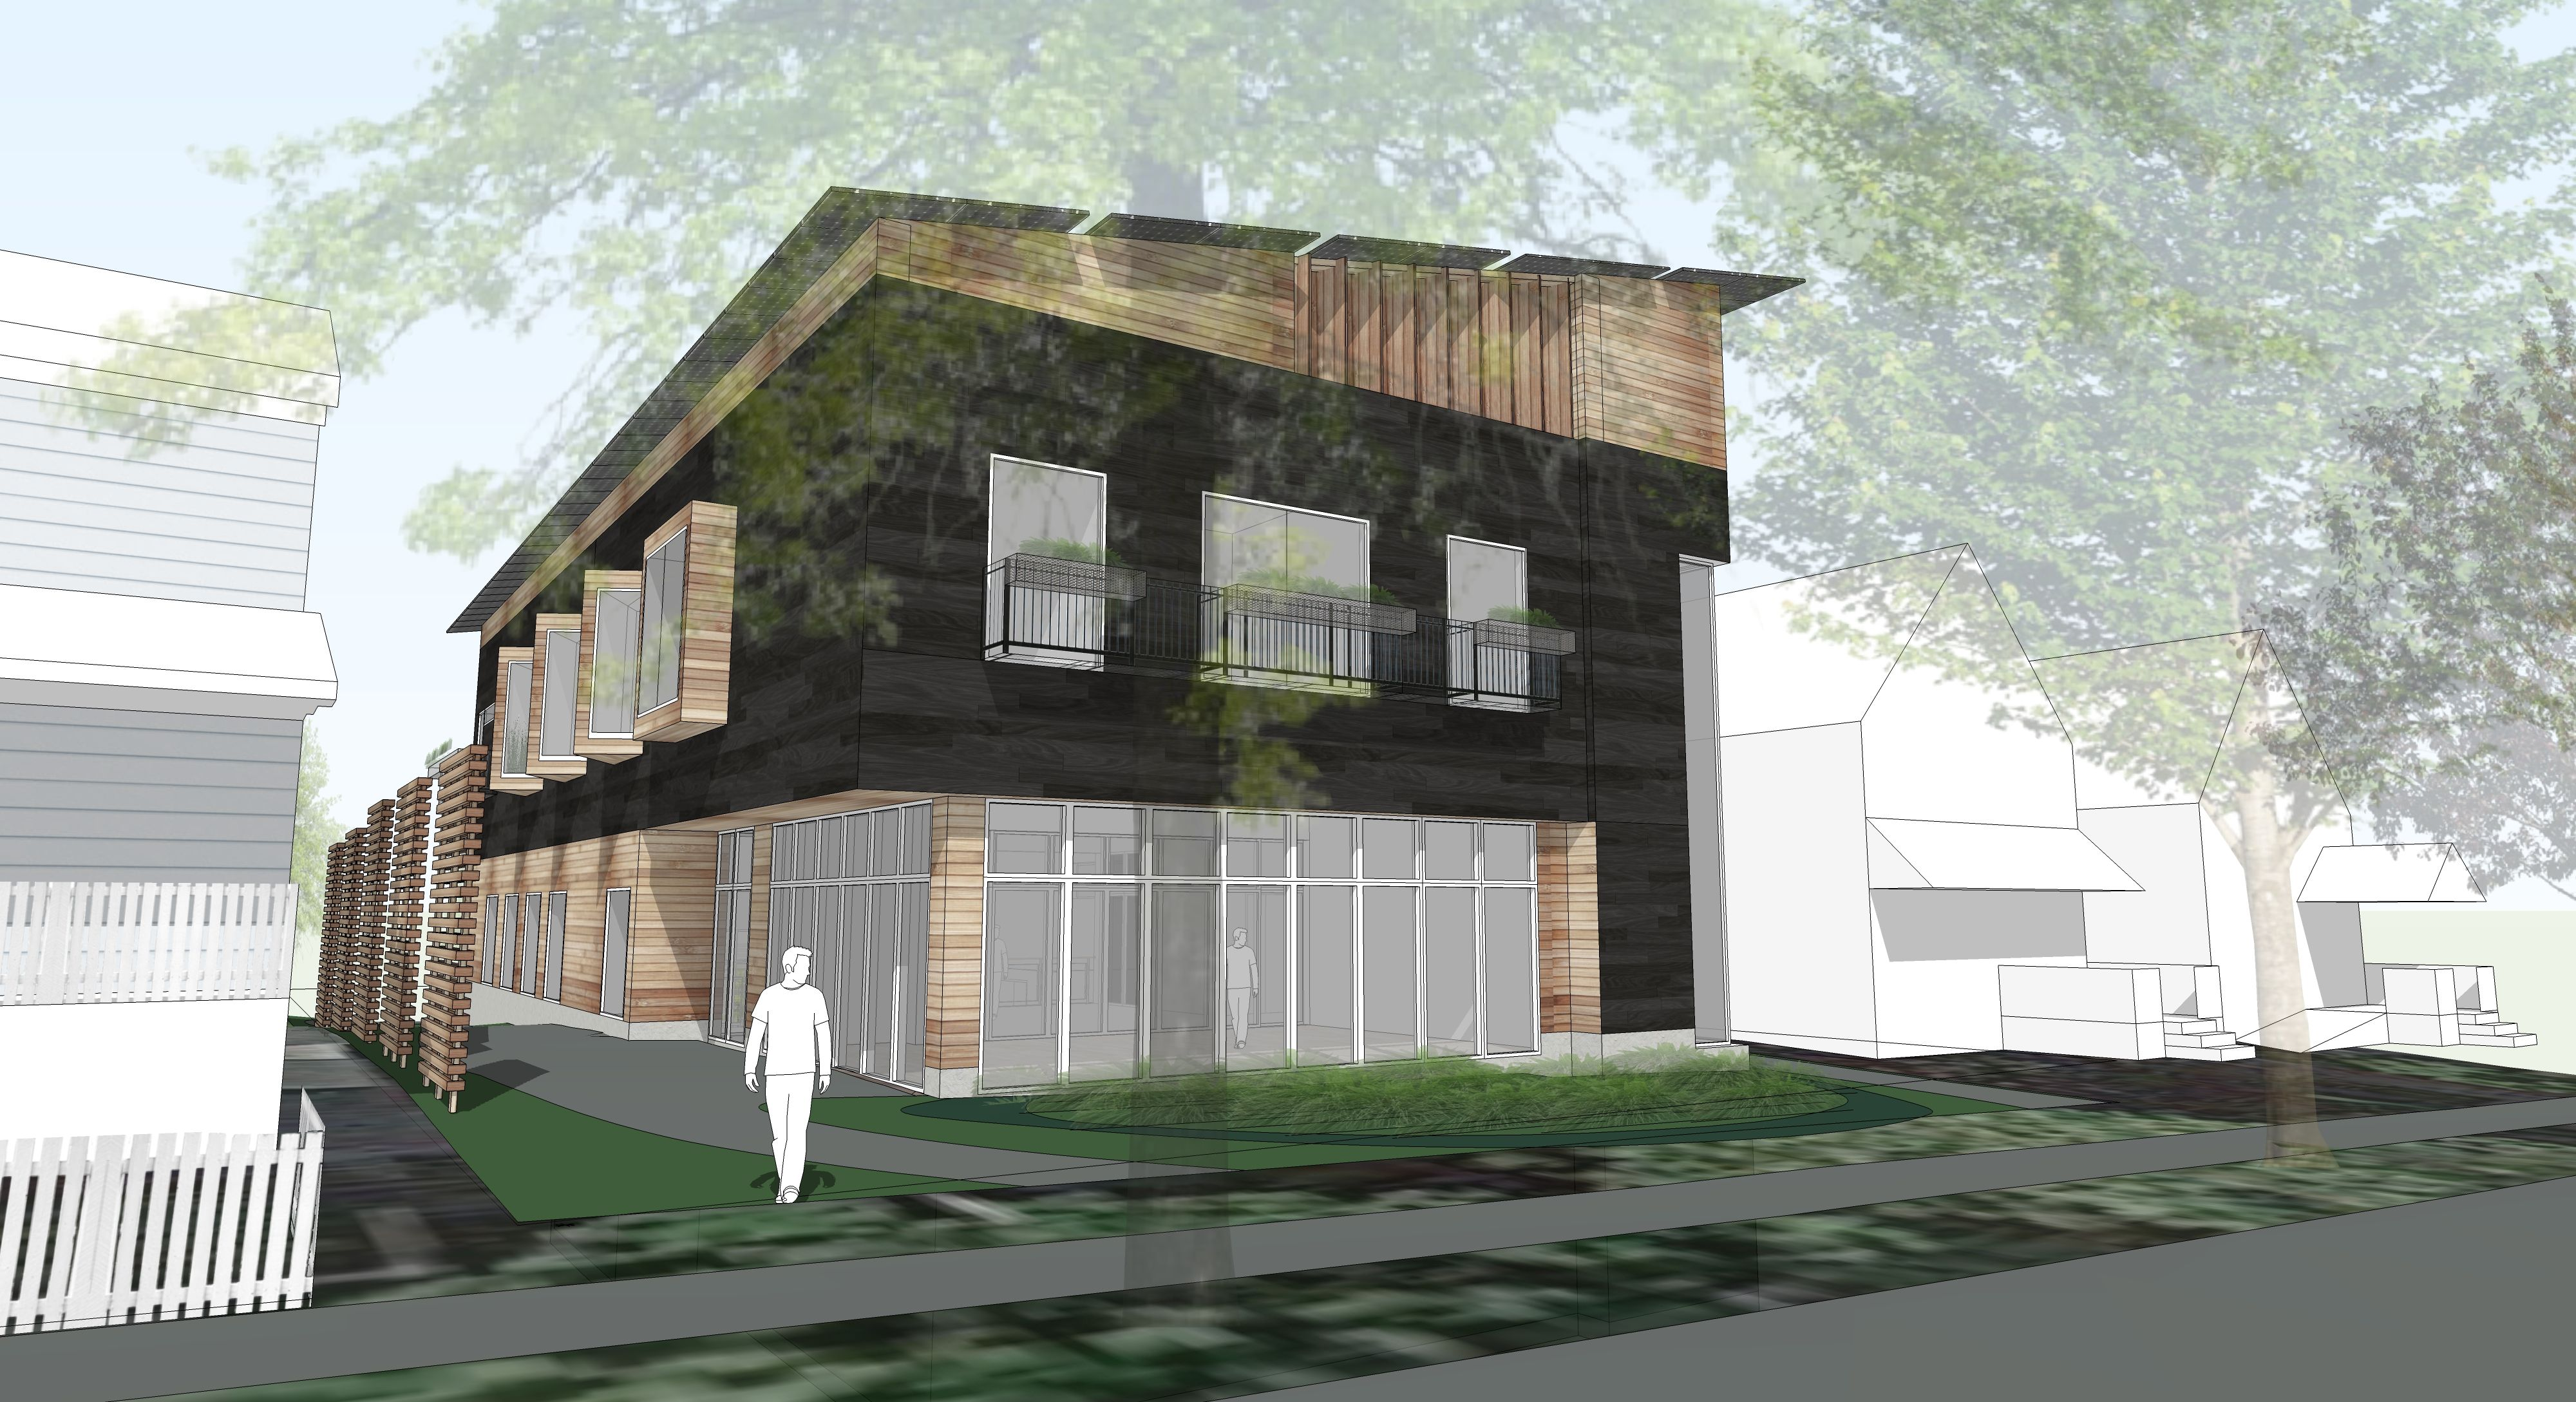 Sketchup For Net Zero Energy Ann Arbor In Design House Styles Outdoor Structures Zero Energy Building